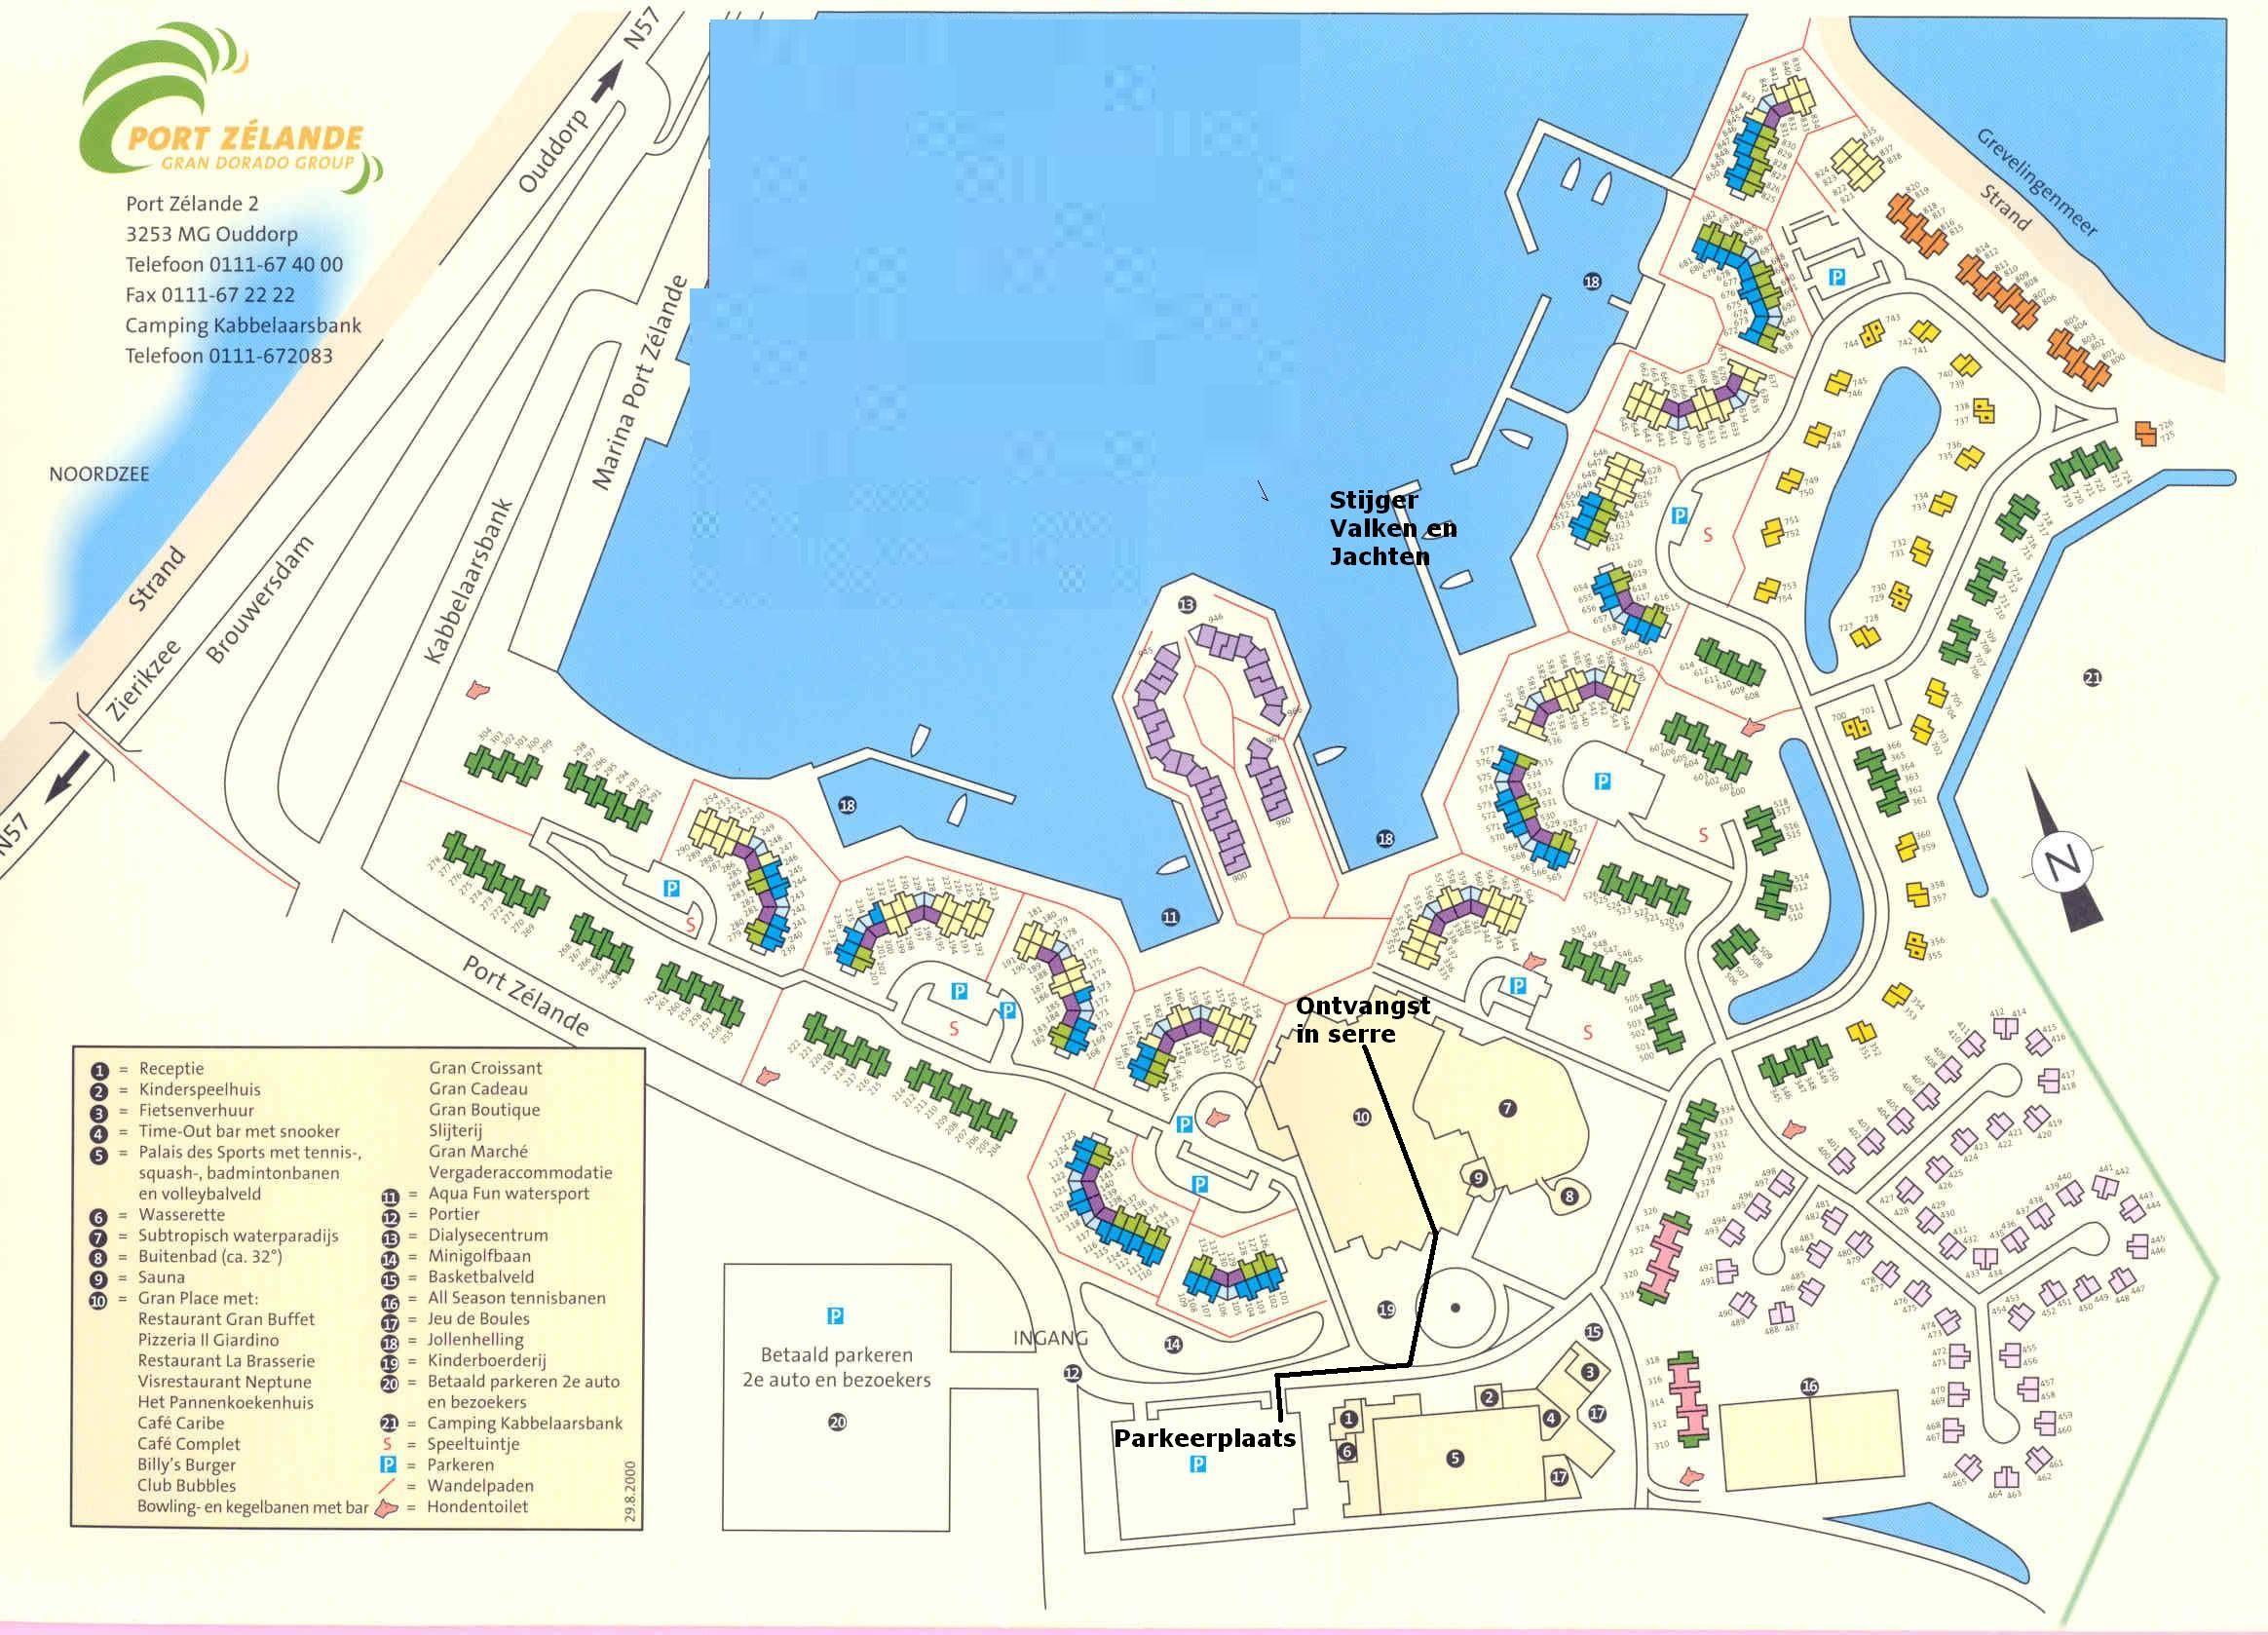 Plattegrond centerparcs port zelande vakanties for Port zelande map